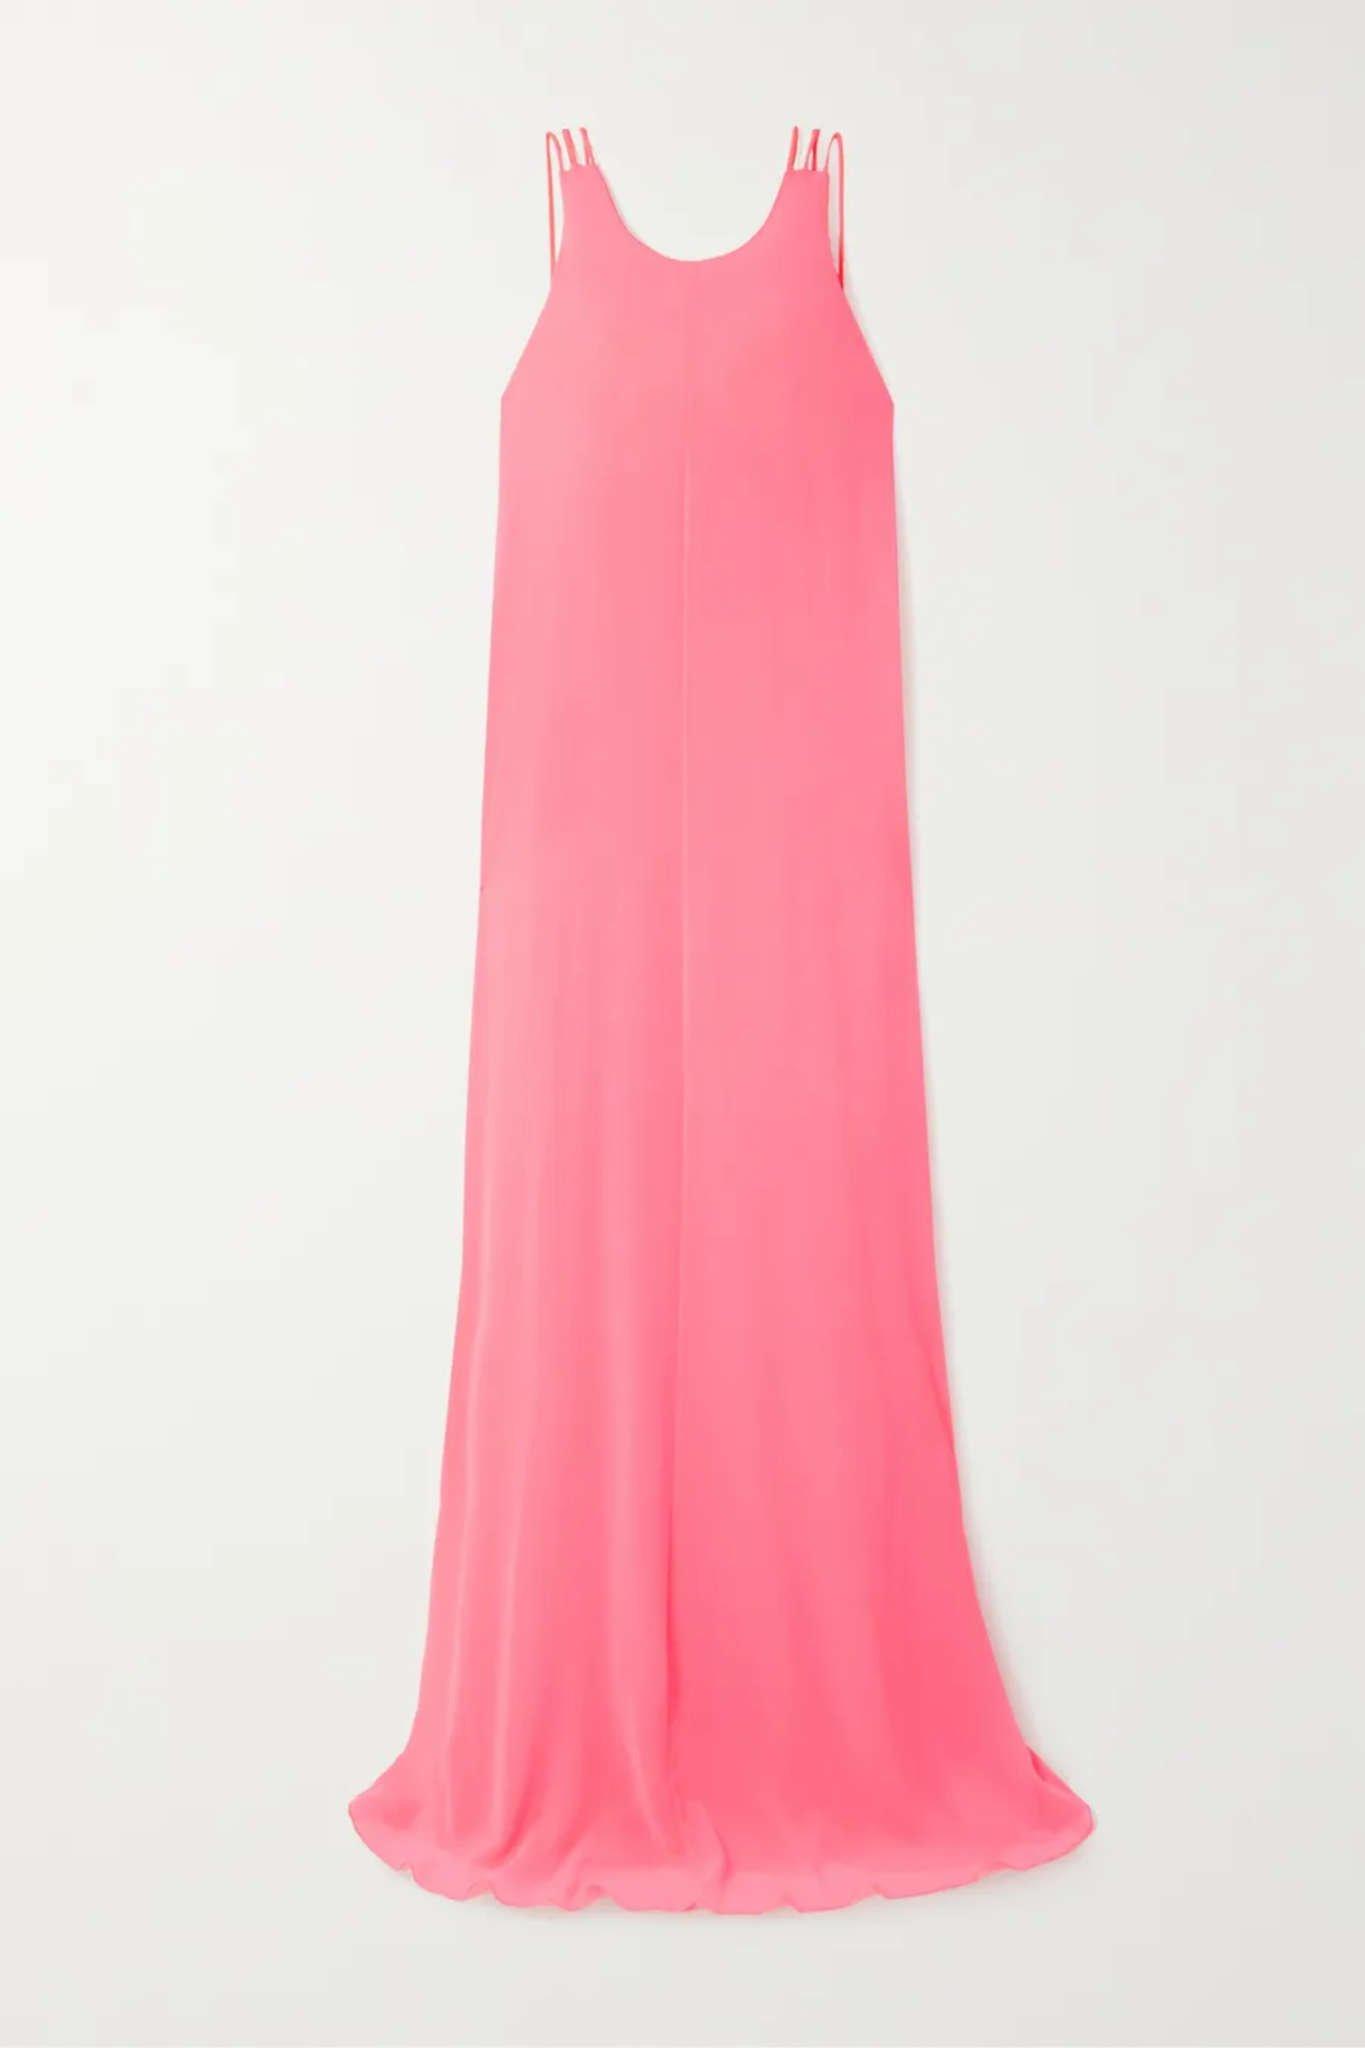 Chrissy Teigen Stuns In Halpern Dress During St. Barts Trip